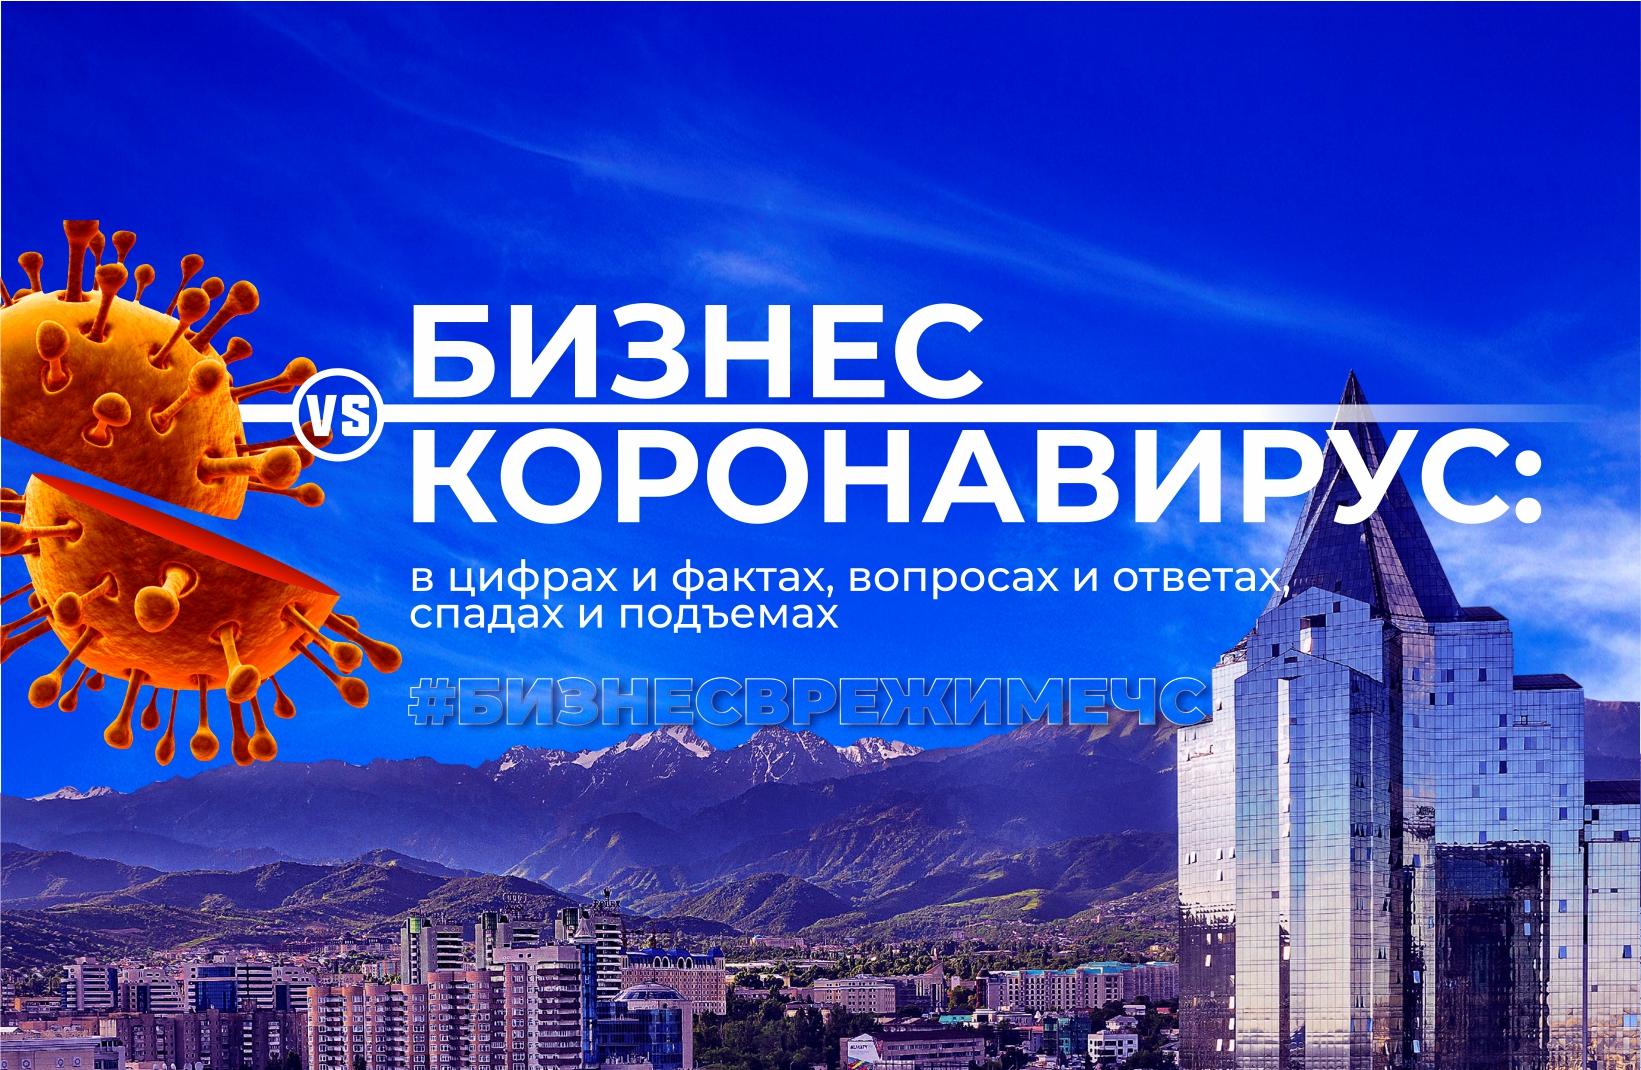 https://inbusiness.kz/ru/images/specimg/19/images/atN0p4MS.jpg